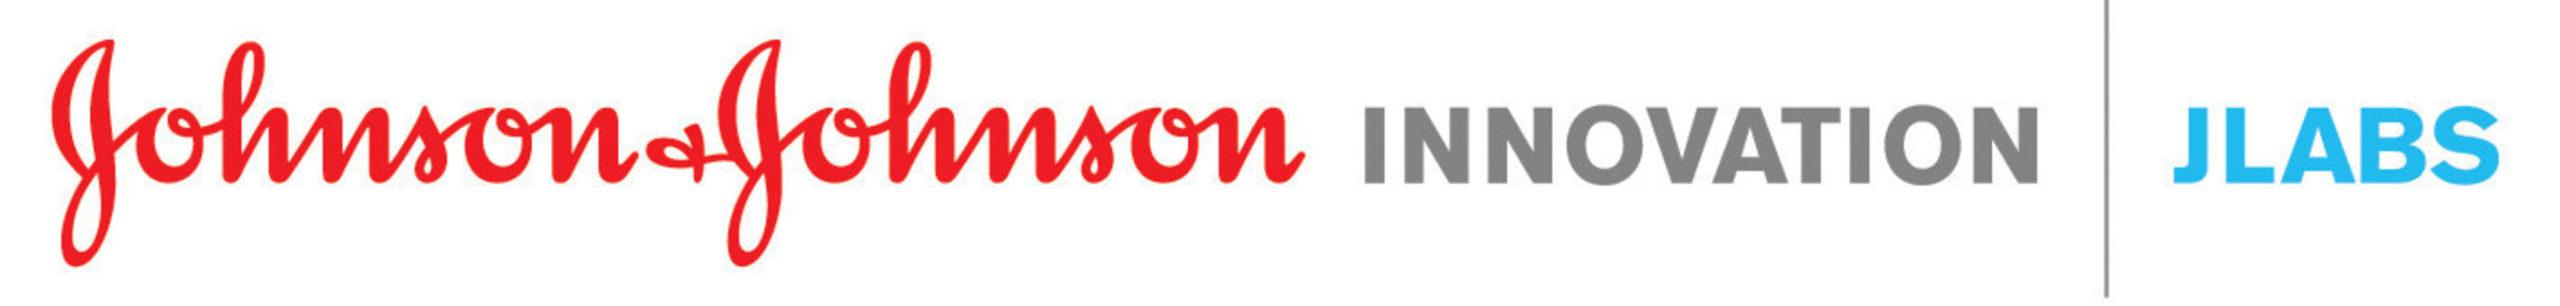 Johnson & Johnson Innovation, JLABS (PRNewsFoto/Johnson & Johnson Innovation, LL)